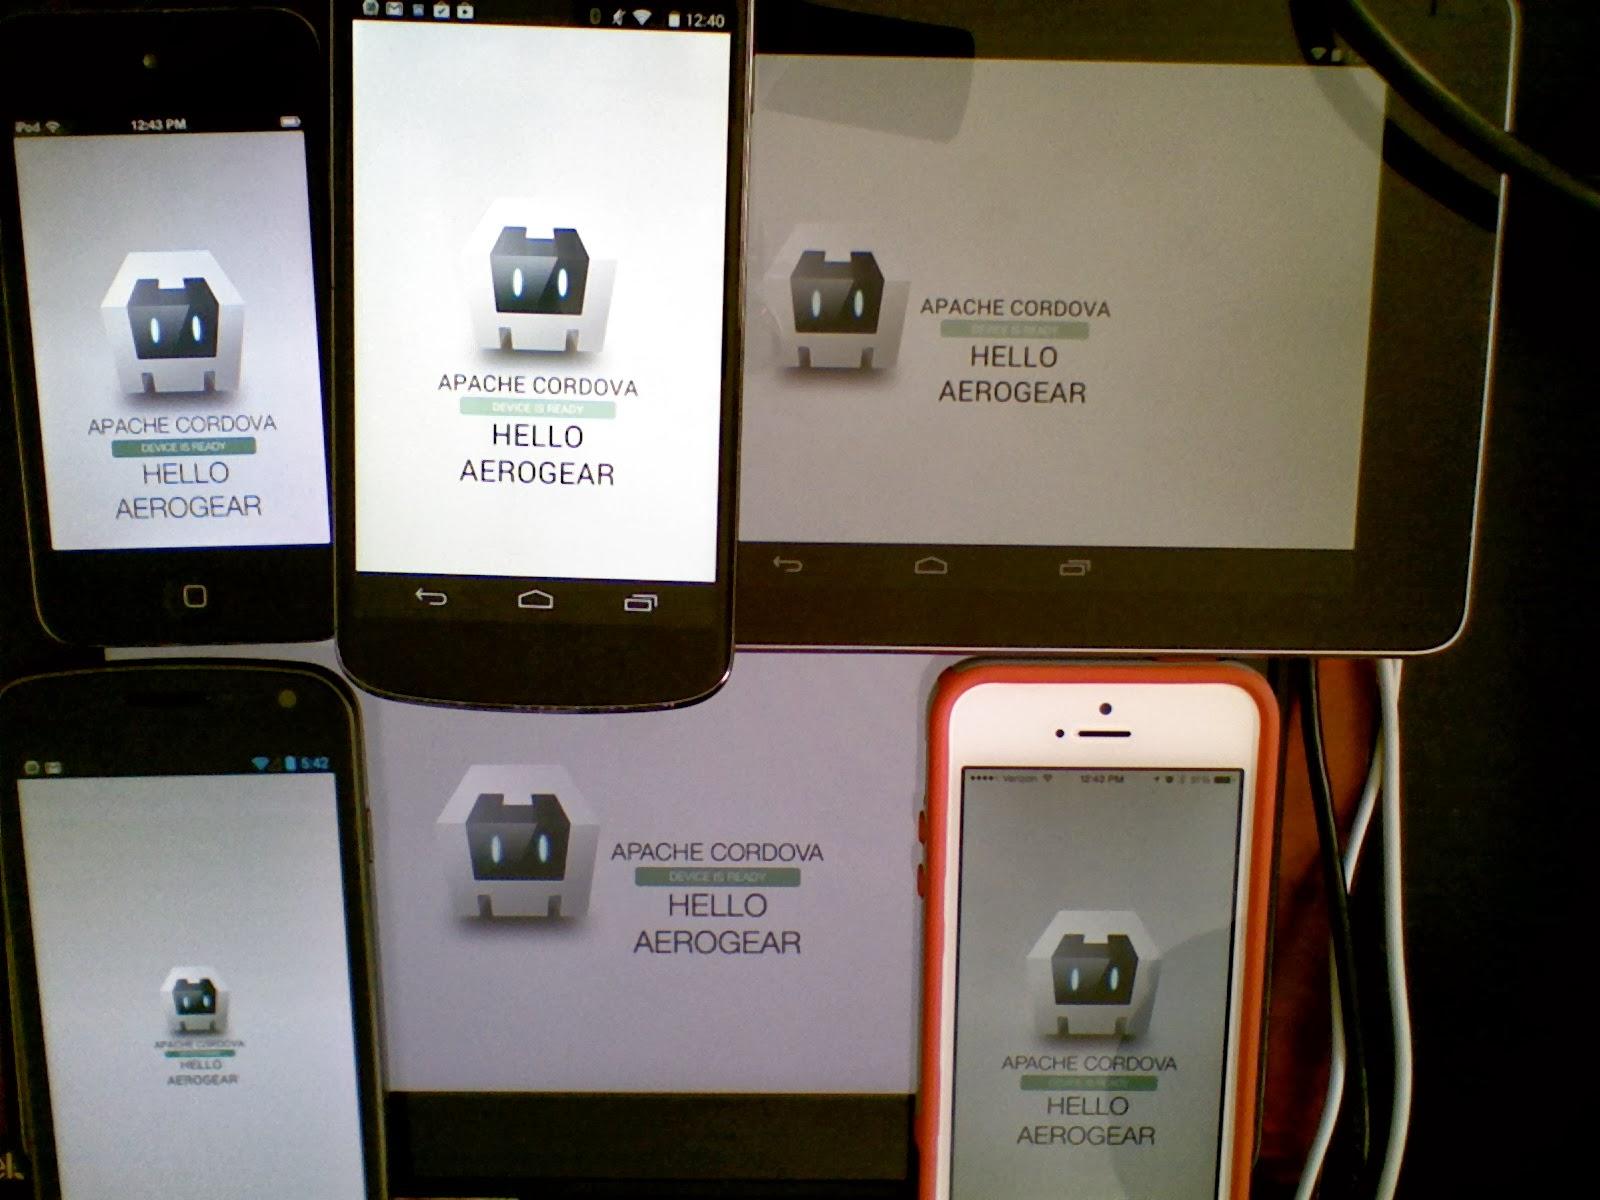 Burr Blog: iOS APNS & Android GCM Push with Apache Cordova